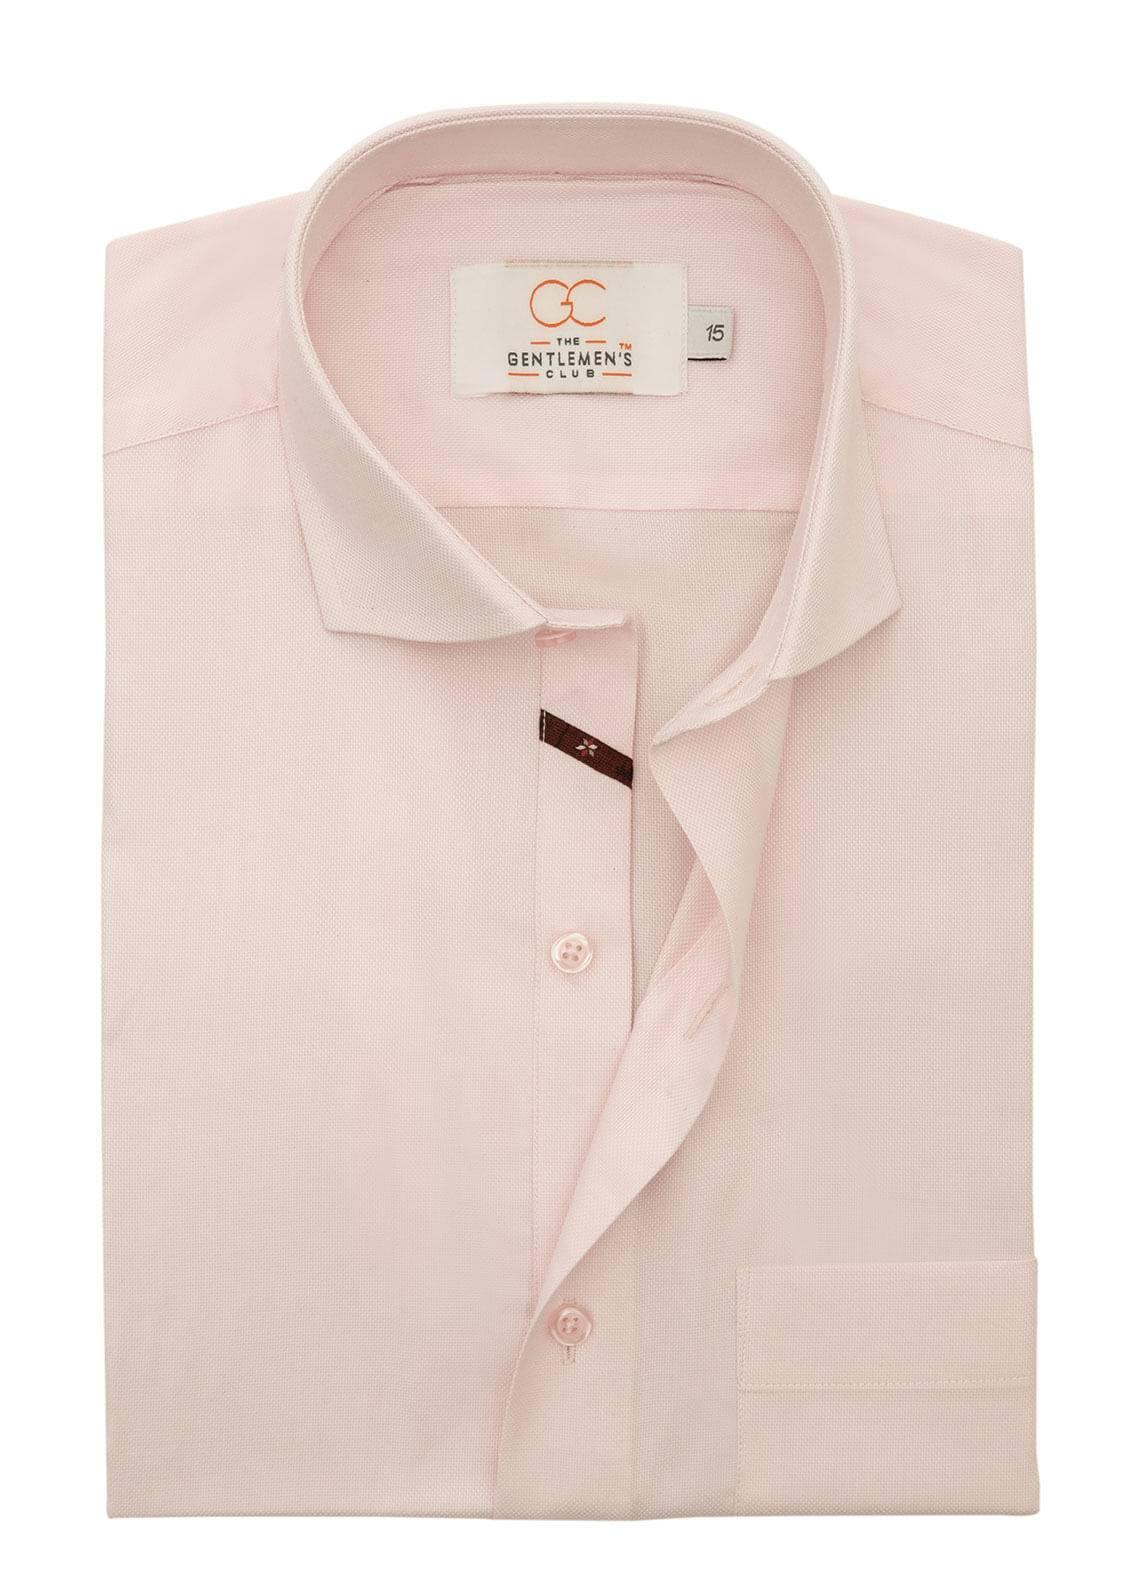 The Gentlemen's Club Cotton Formal Men Shirts - Pink White Label 4071 - 18.5